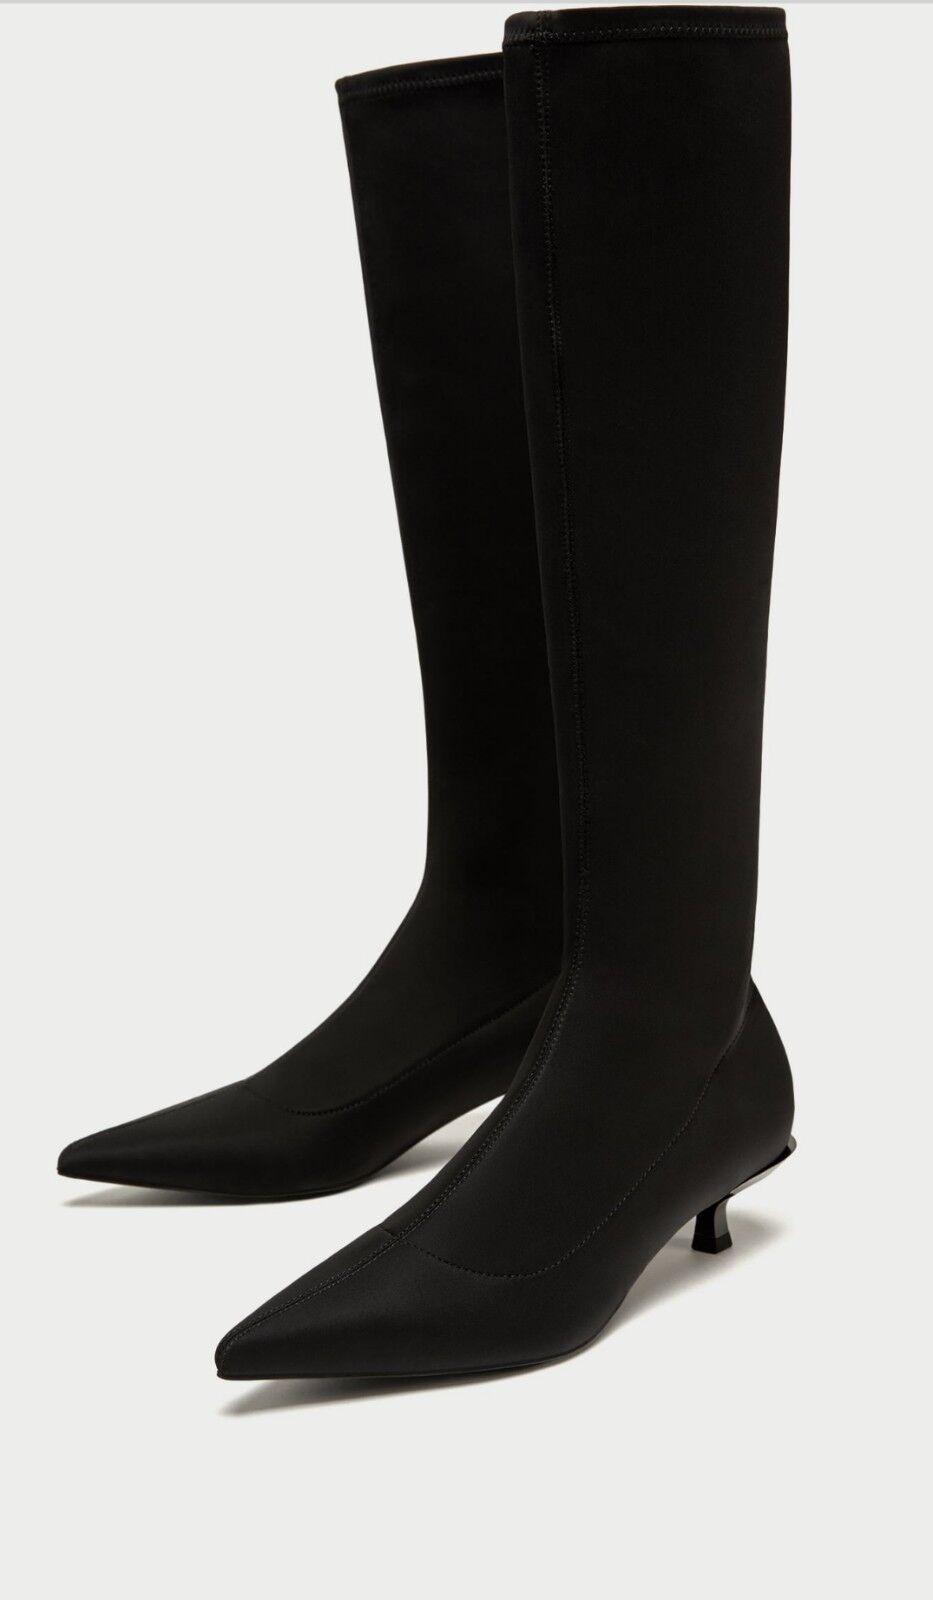 ZARA BLACK ELASTIC  HIGH HEEL BOOTS SIZE UK-7  EU-40